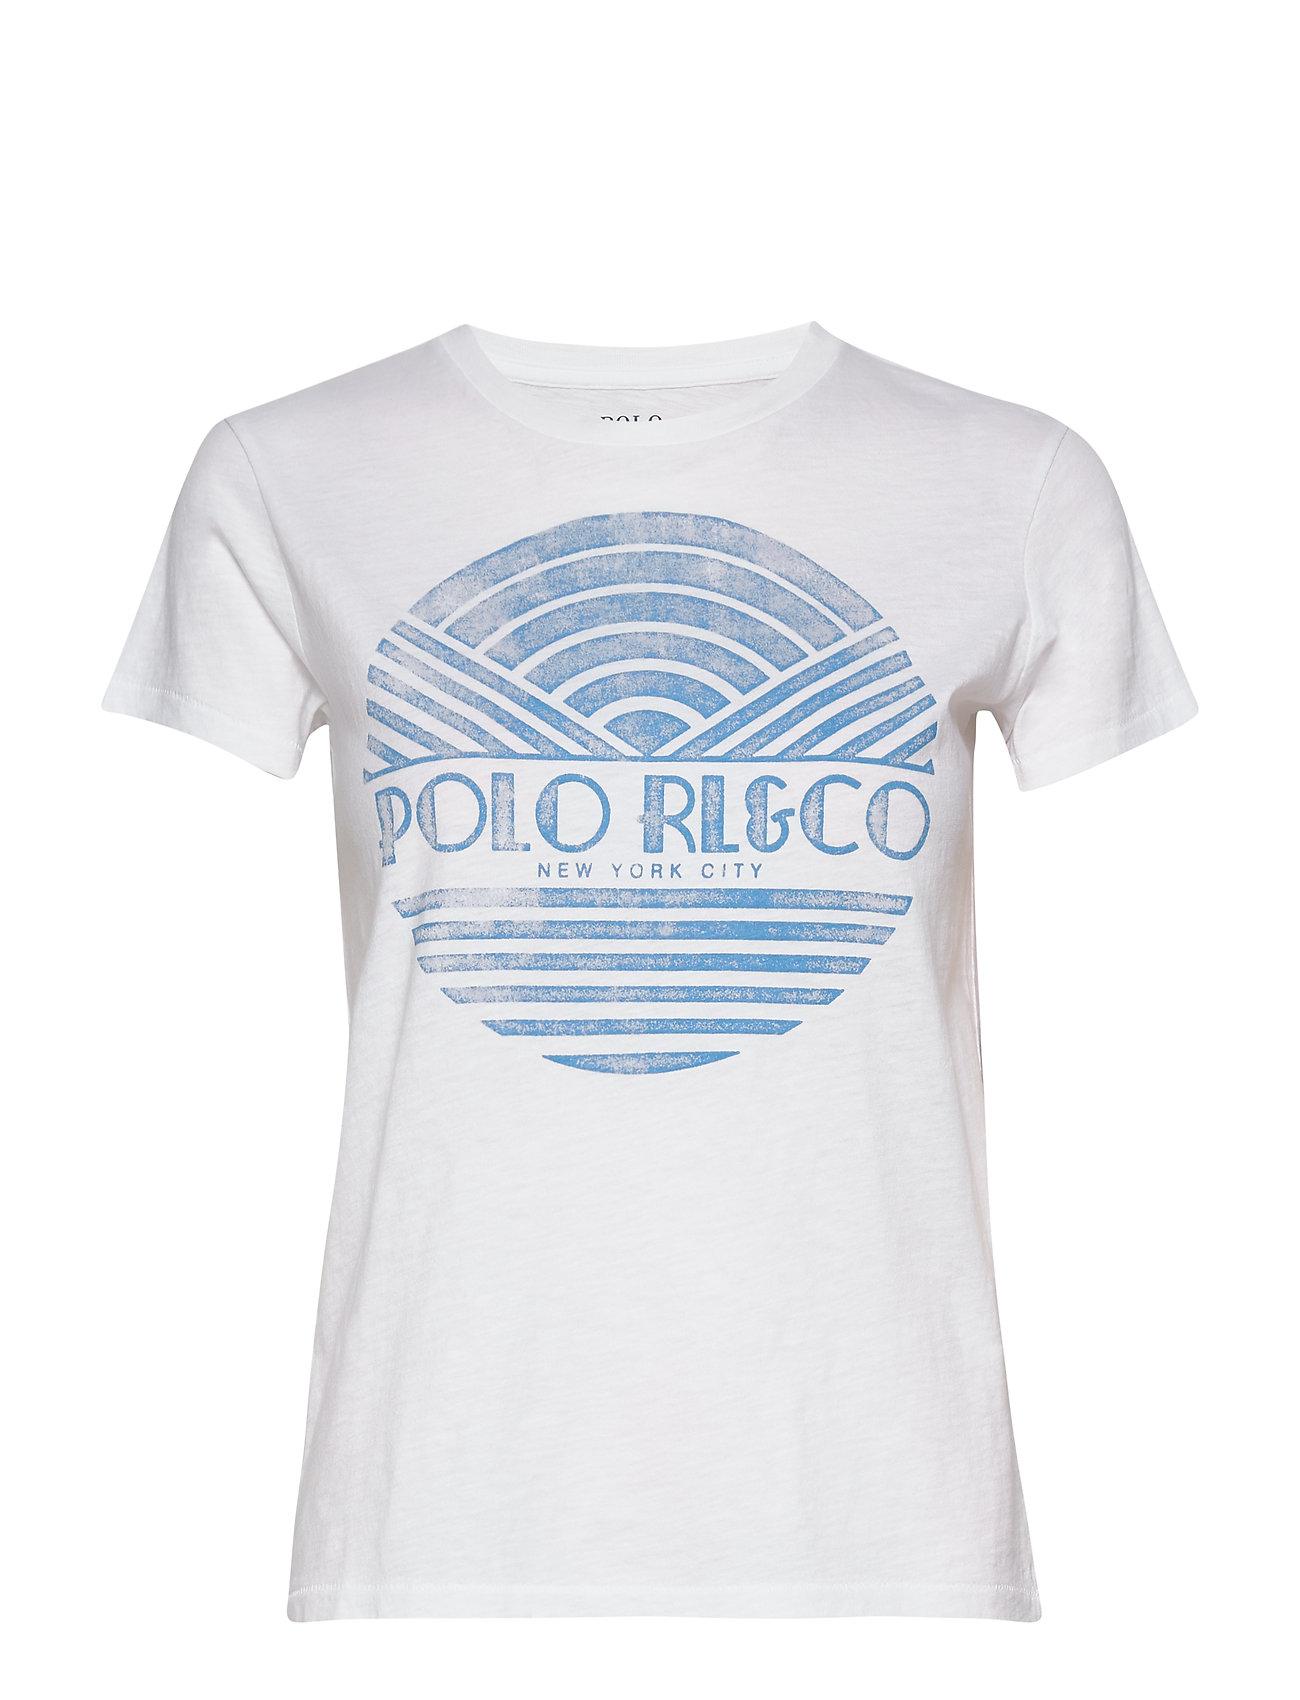 Polo Ralph Lauren Cotton Jersey Graphic Tee - WHITE